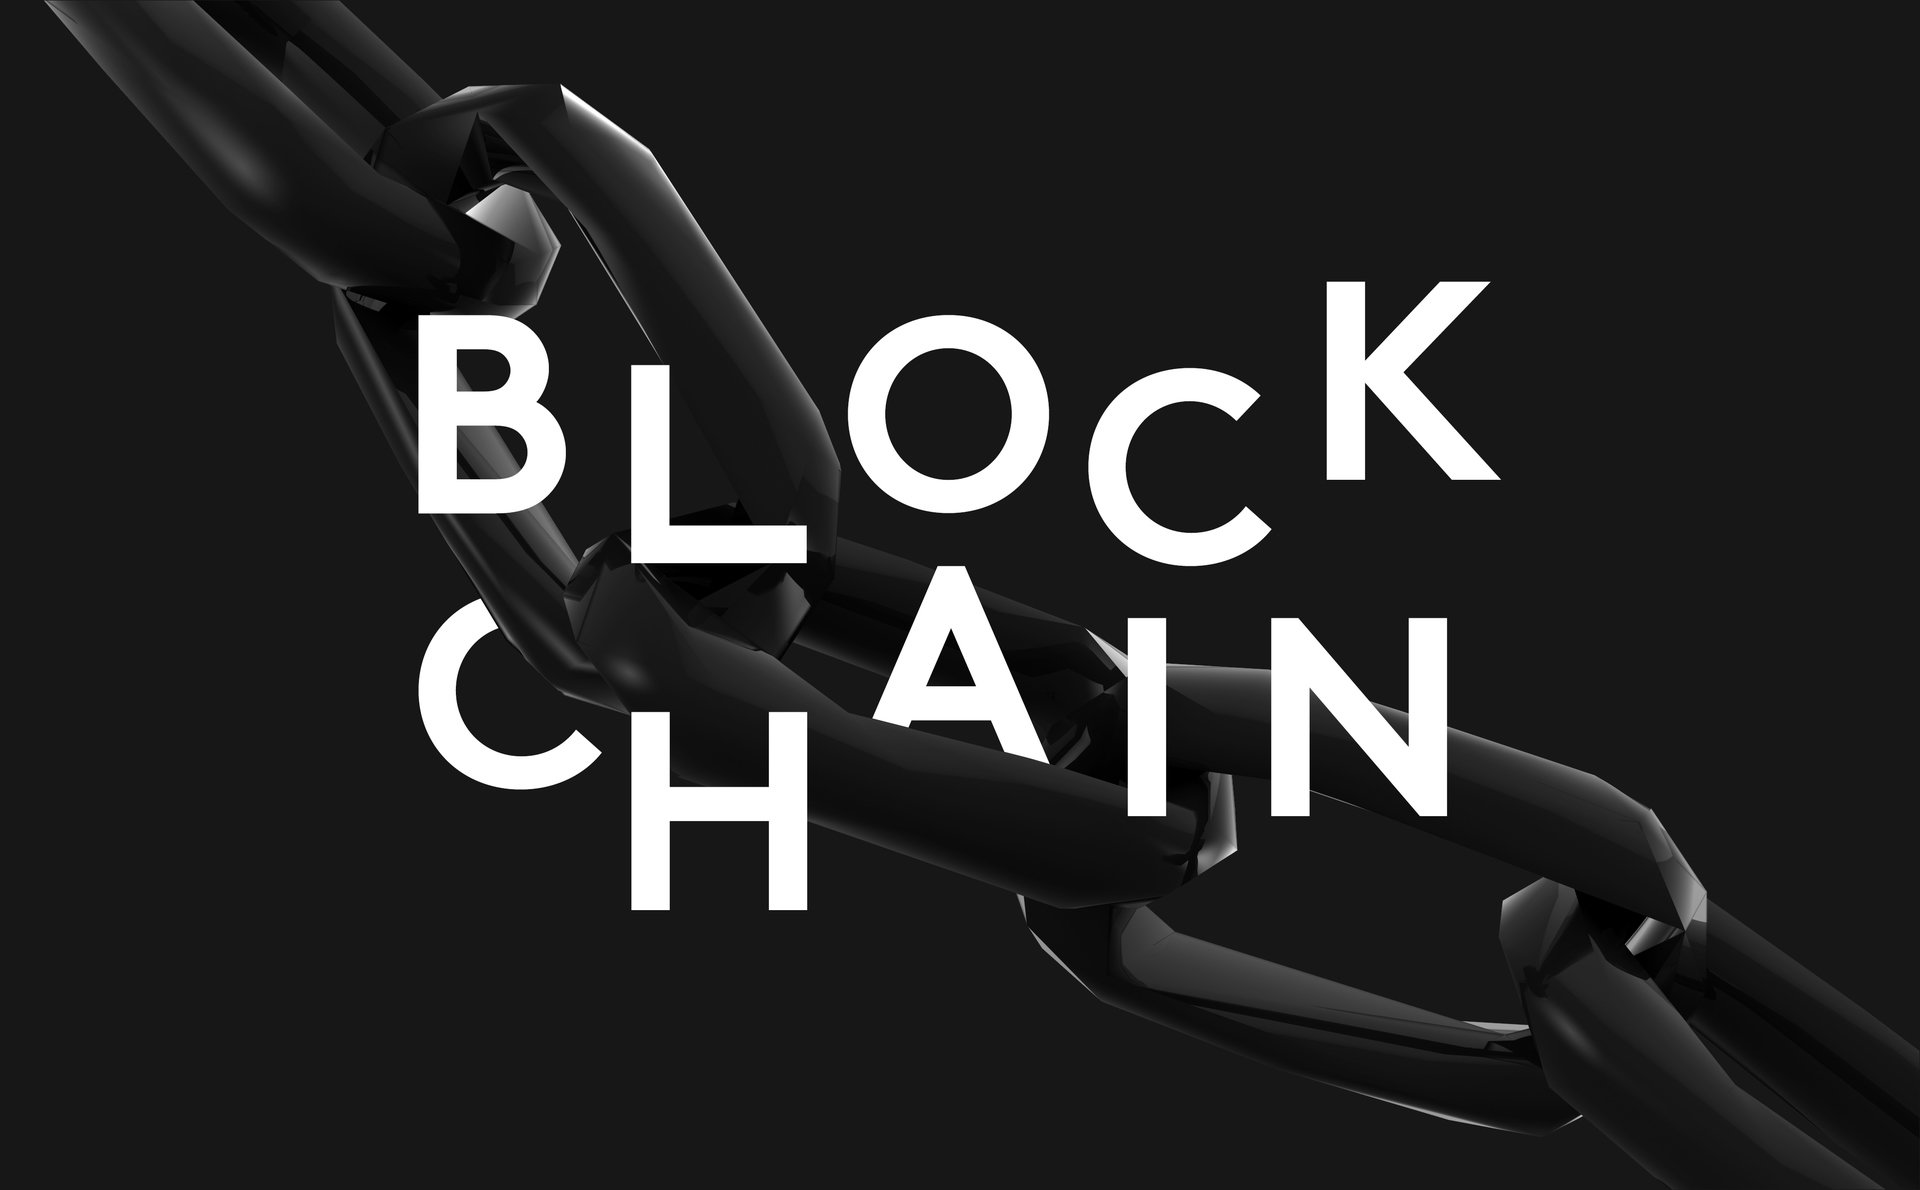 Billon sets industry-standard benchmark for blockchain scalability